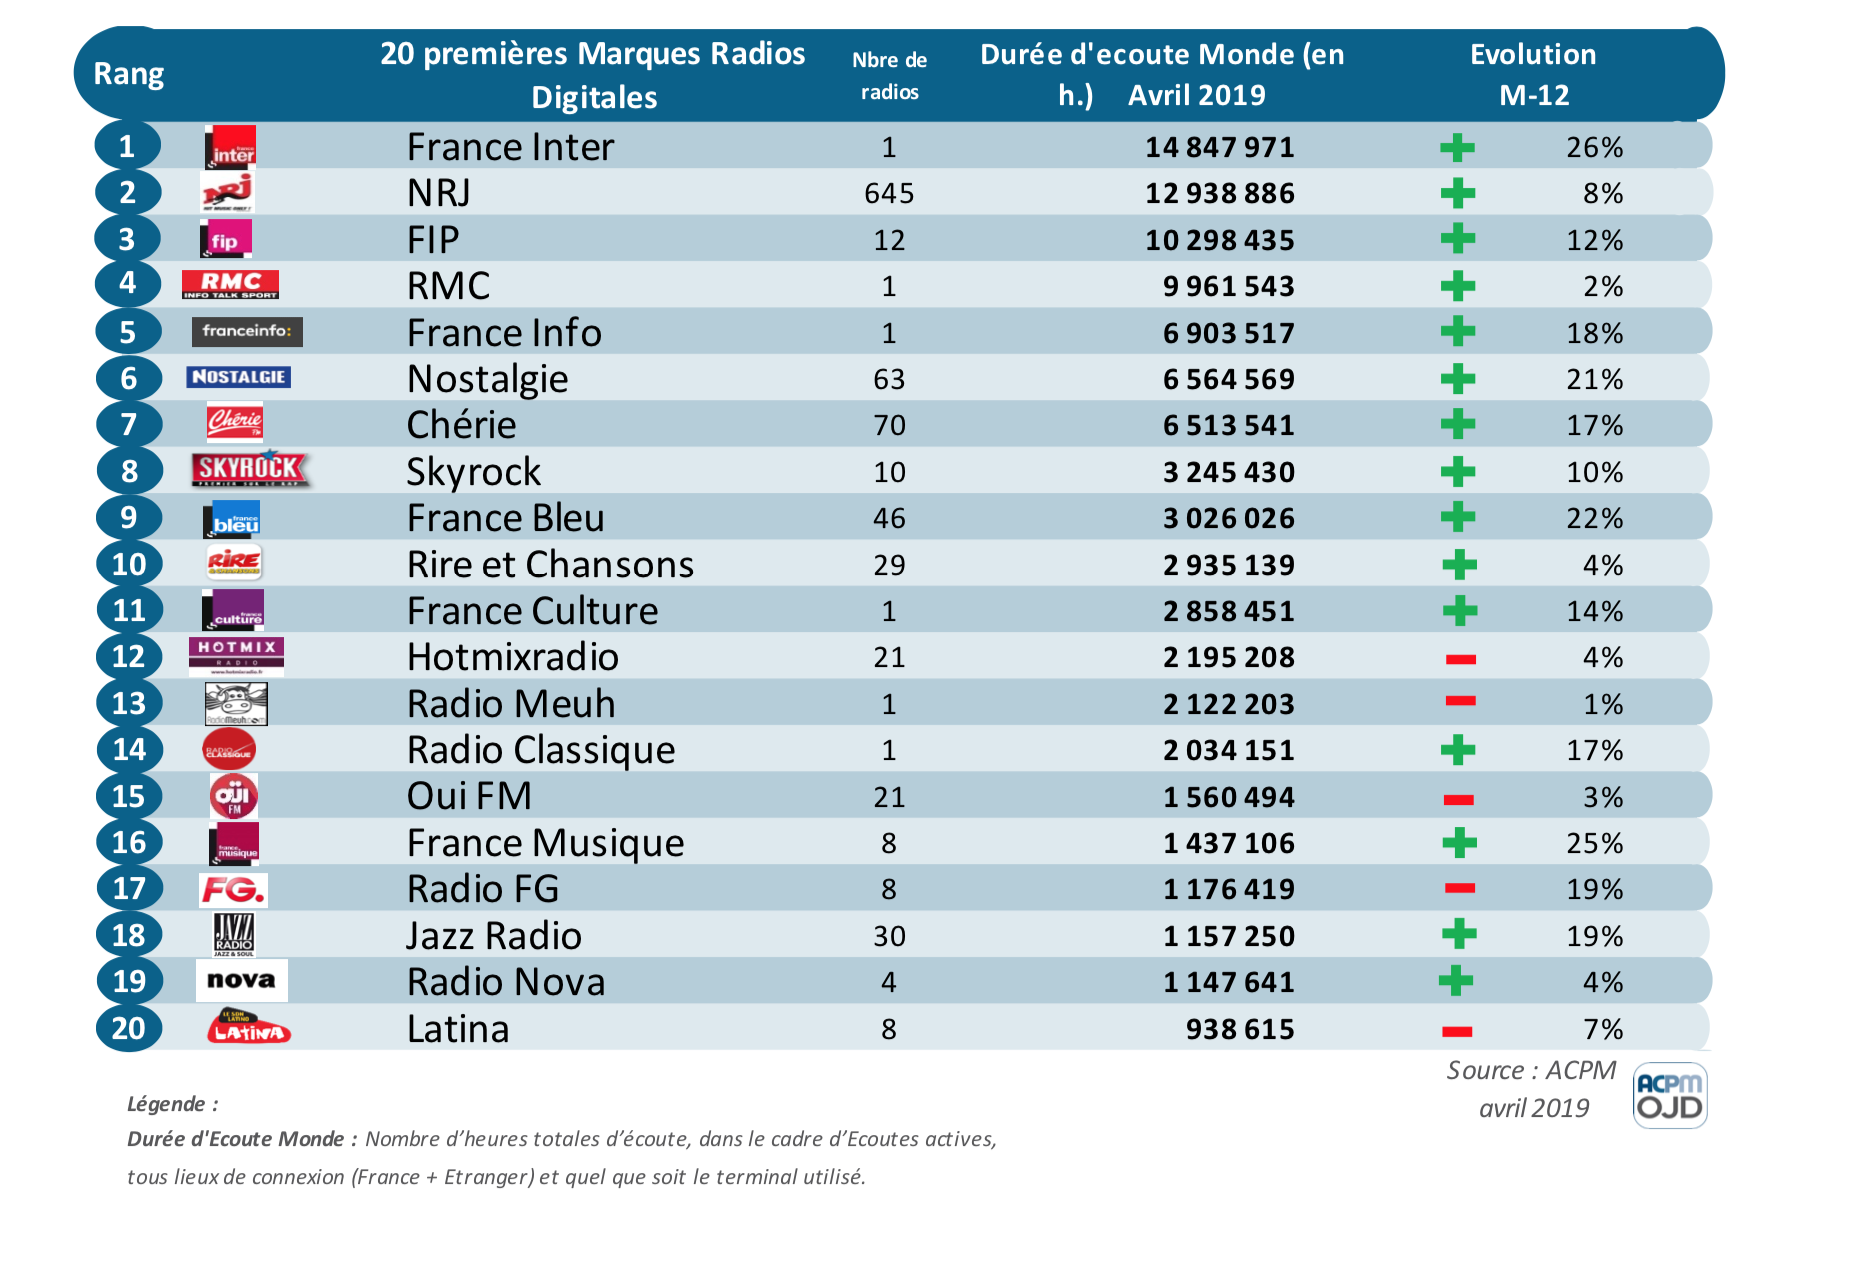 ACPM : les radios les plus performantes en DEA